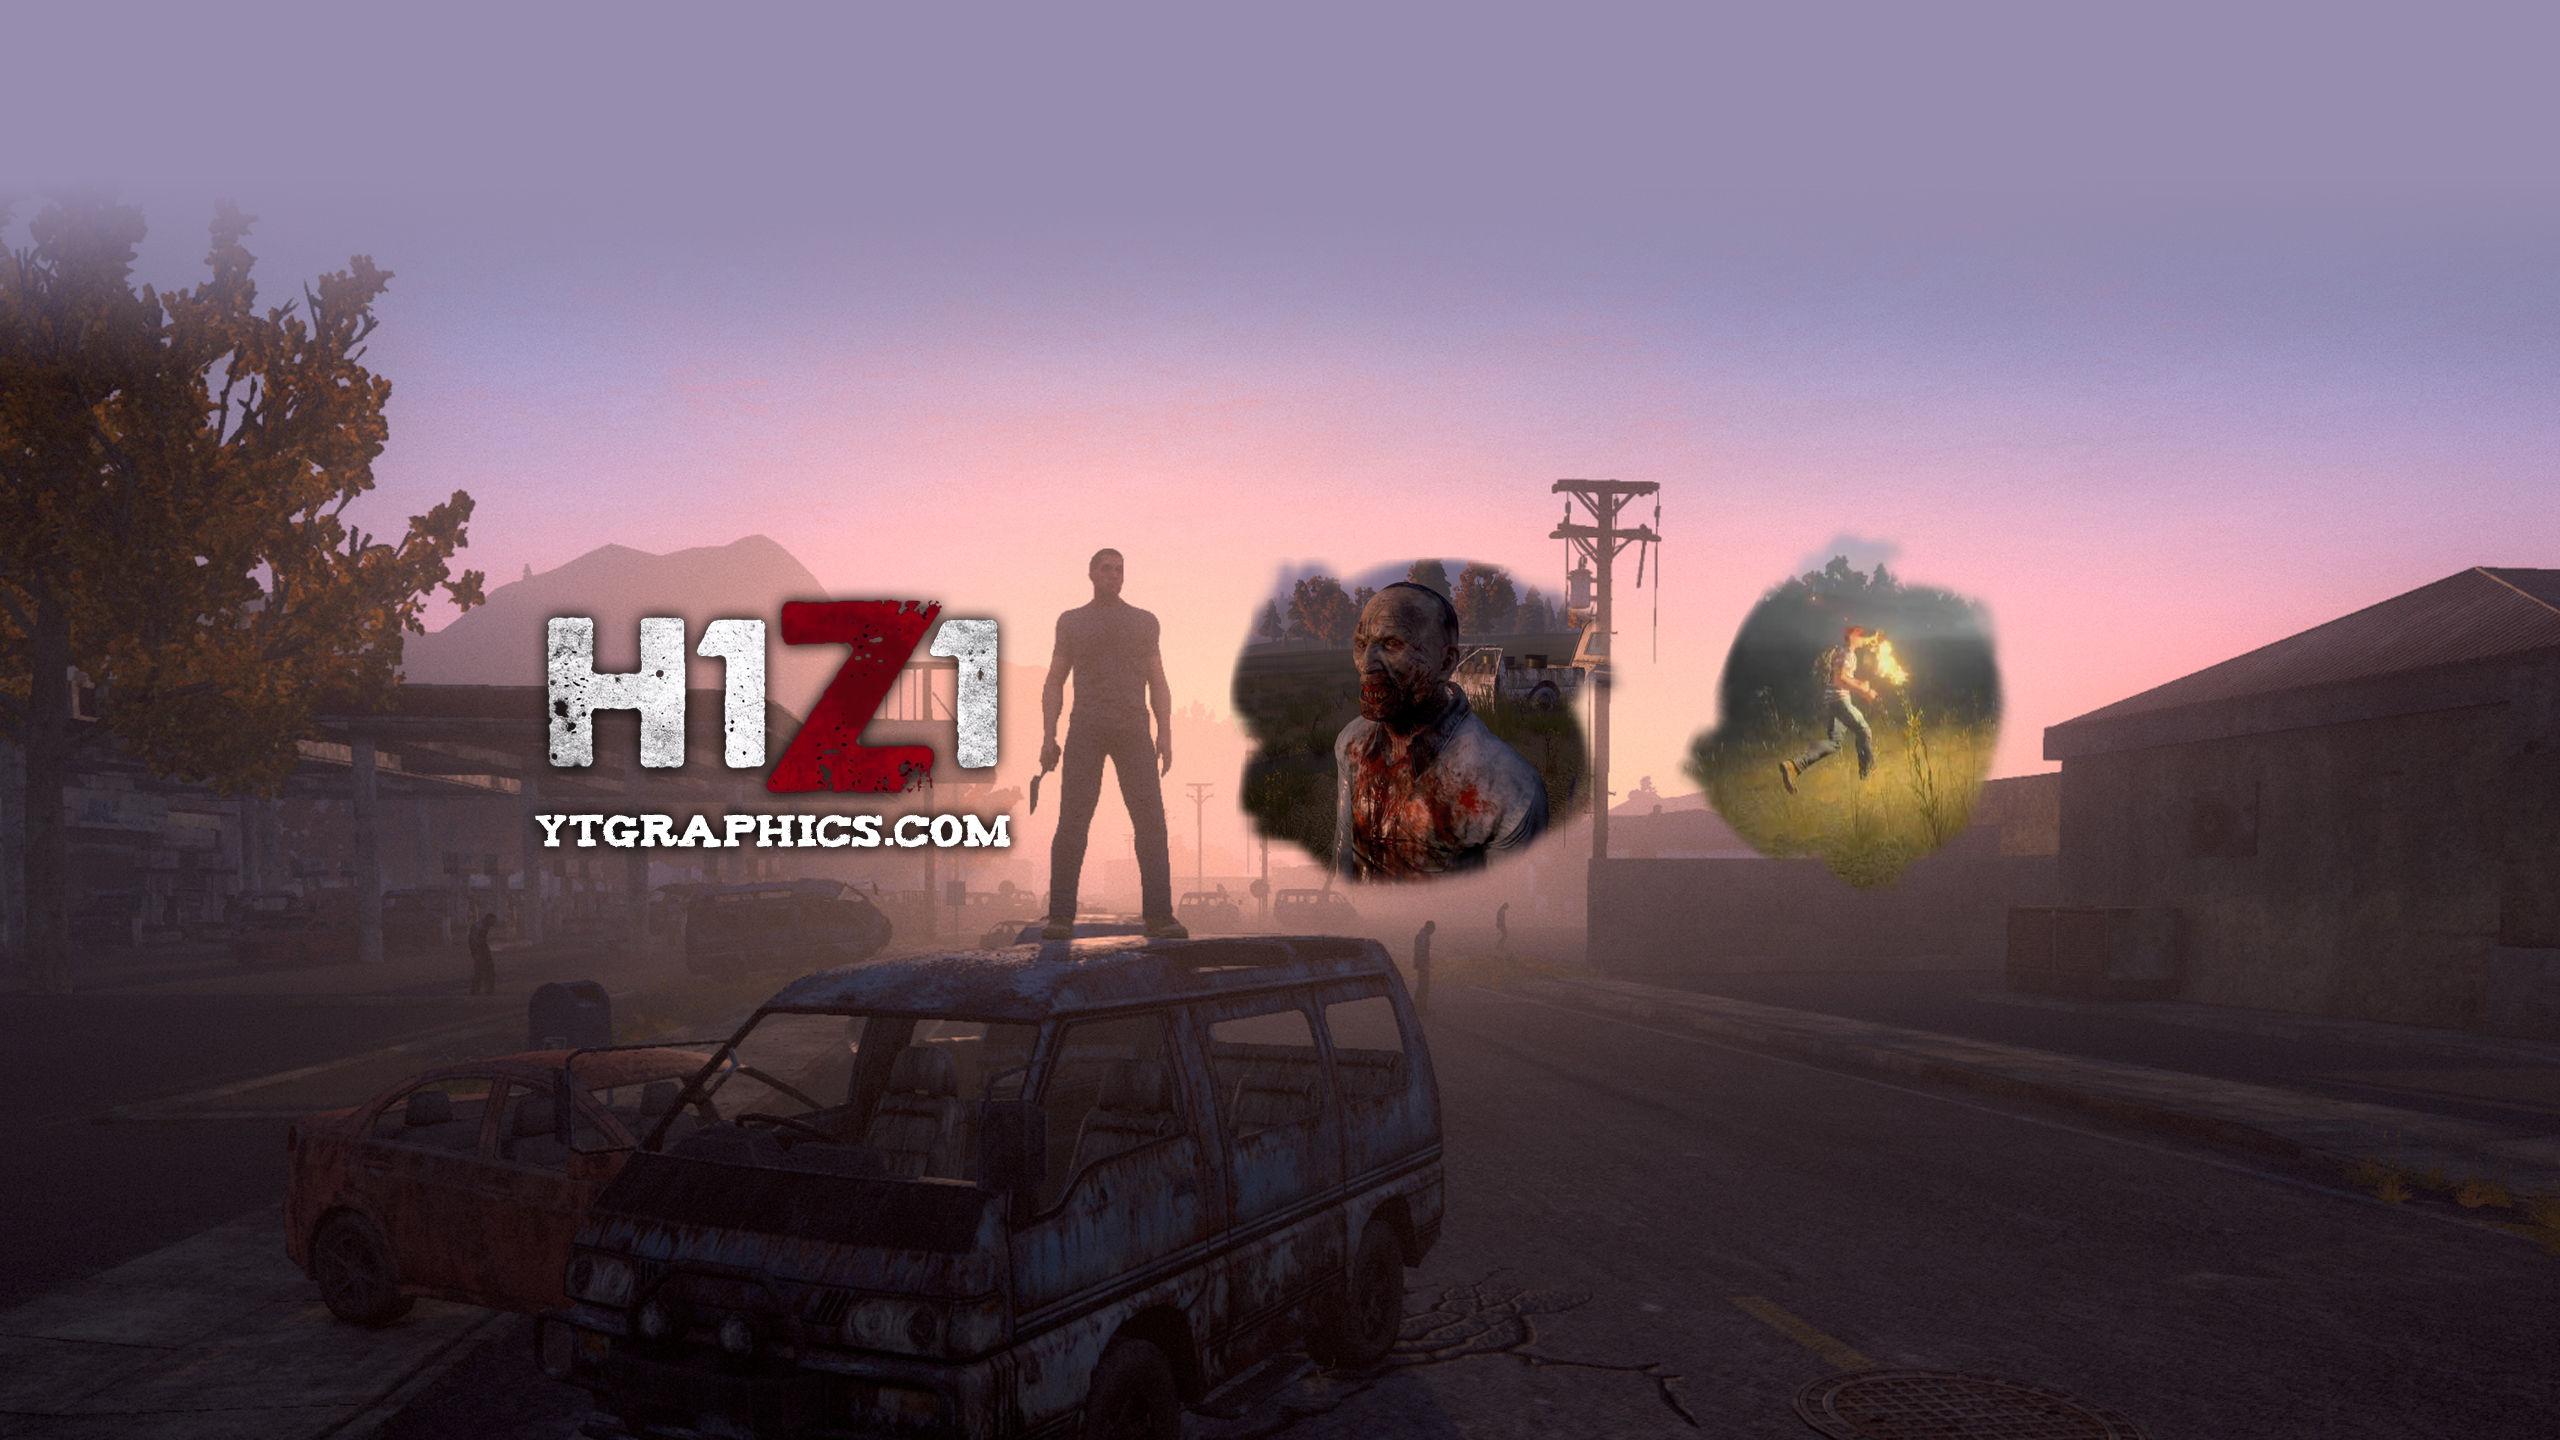 h1z1 wallpaper art